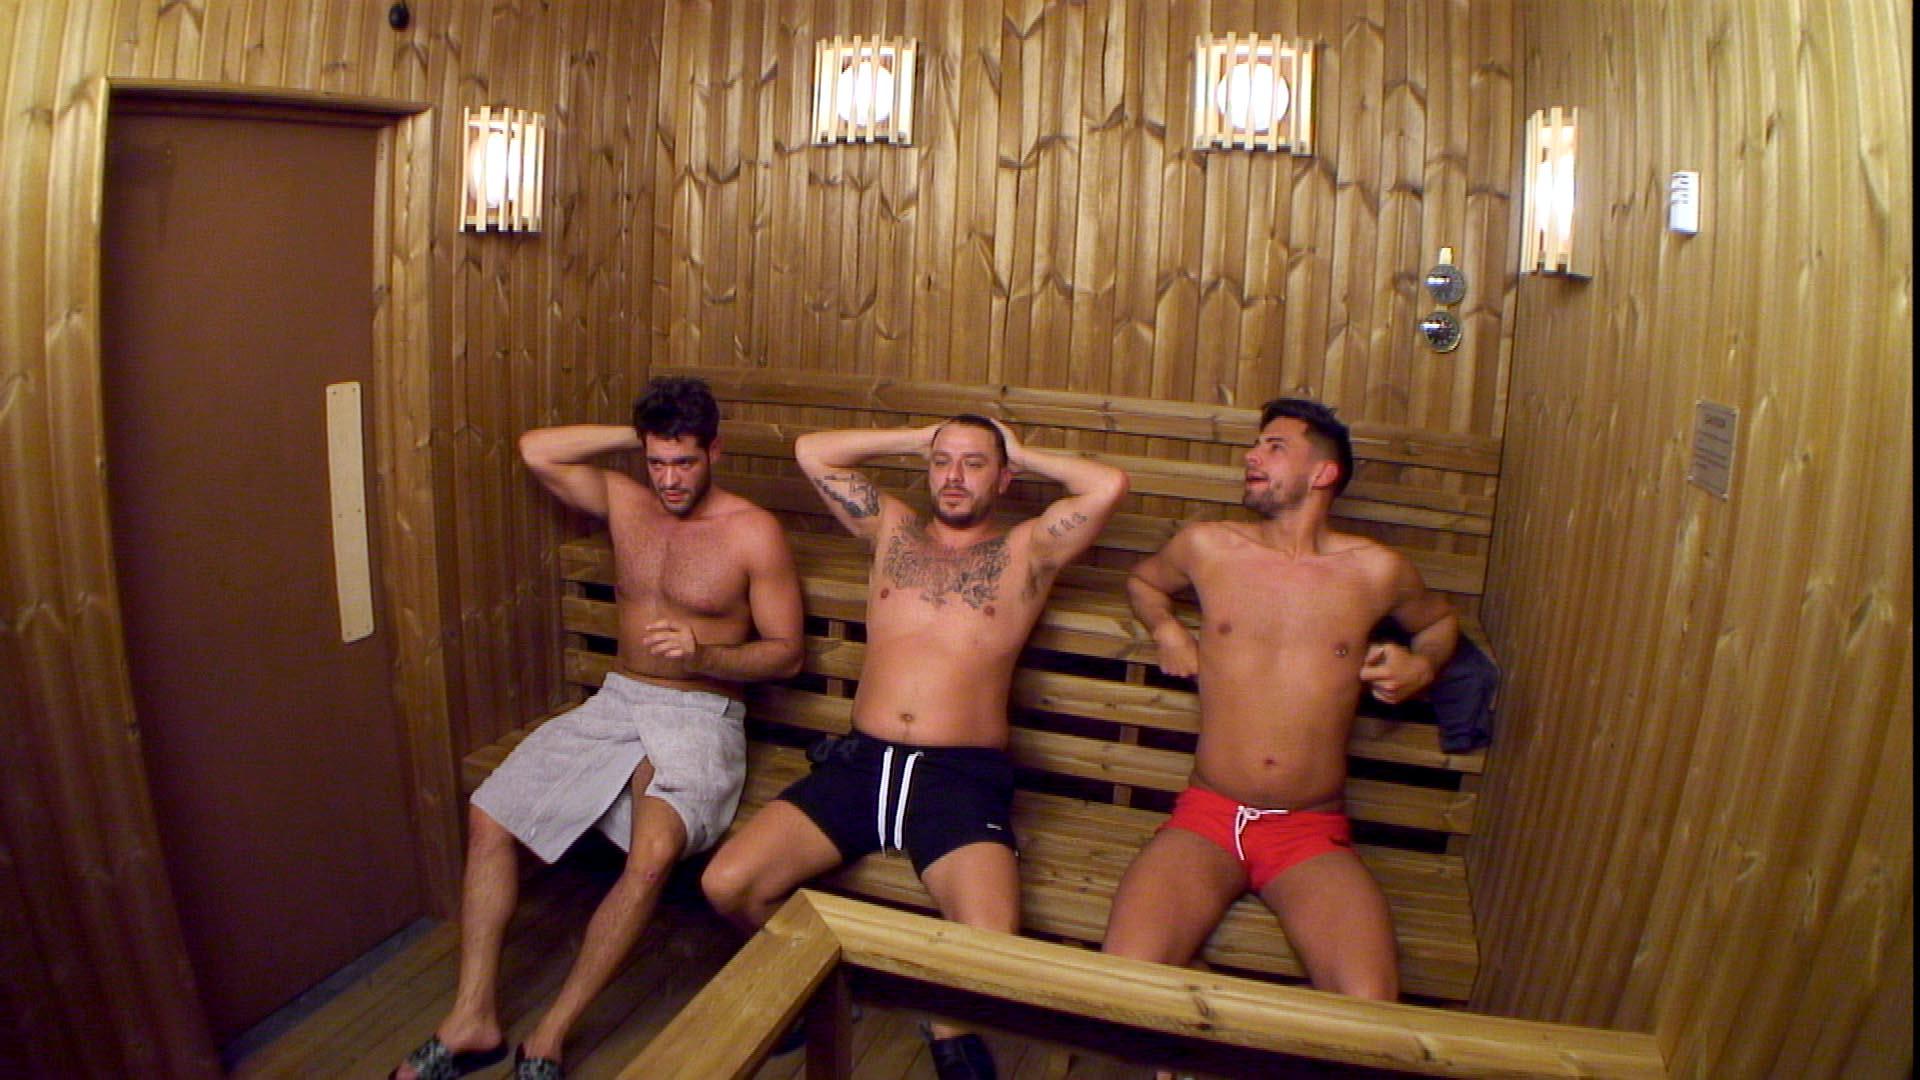 Dapper laughs, Jonny and Andrew